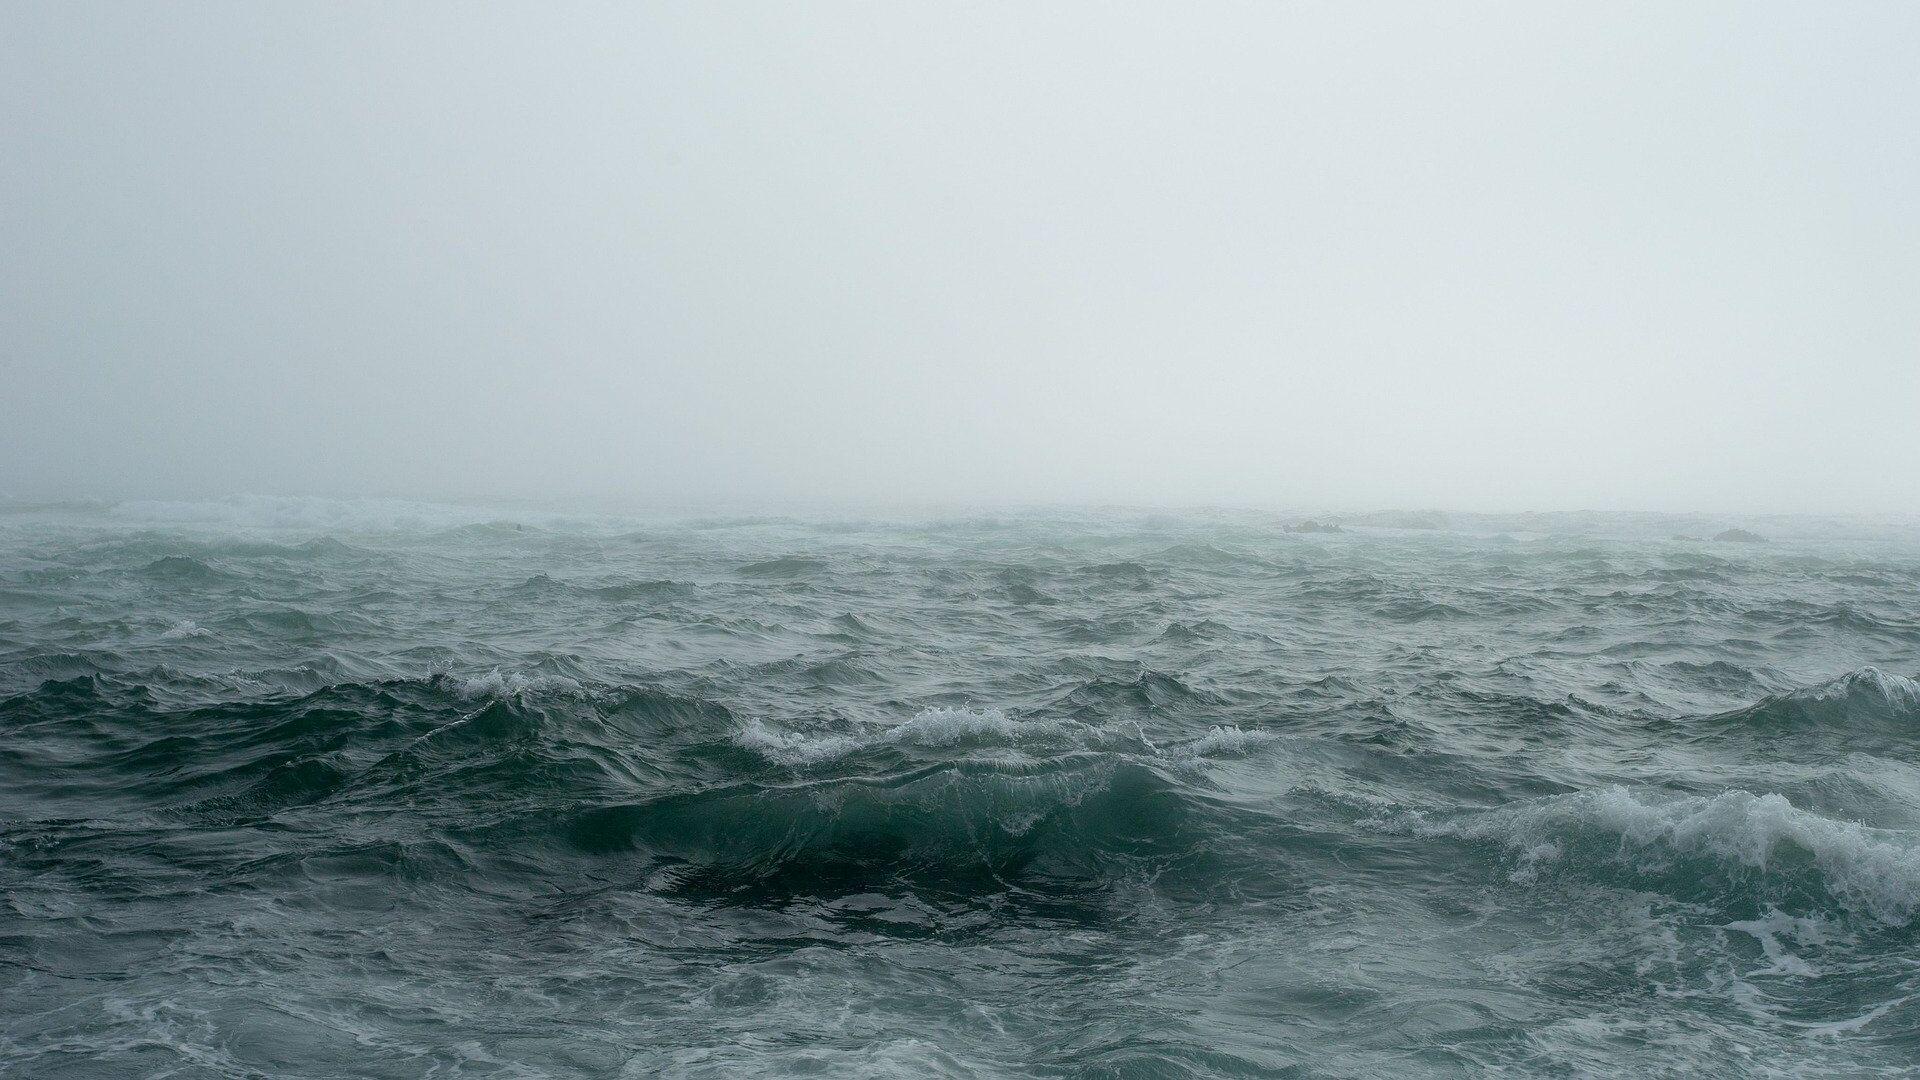 El mar (imagen referencial) - Sputnik Mundo, 1920, 12.03.2021